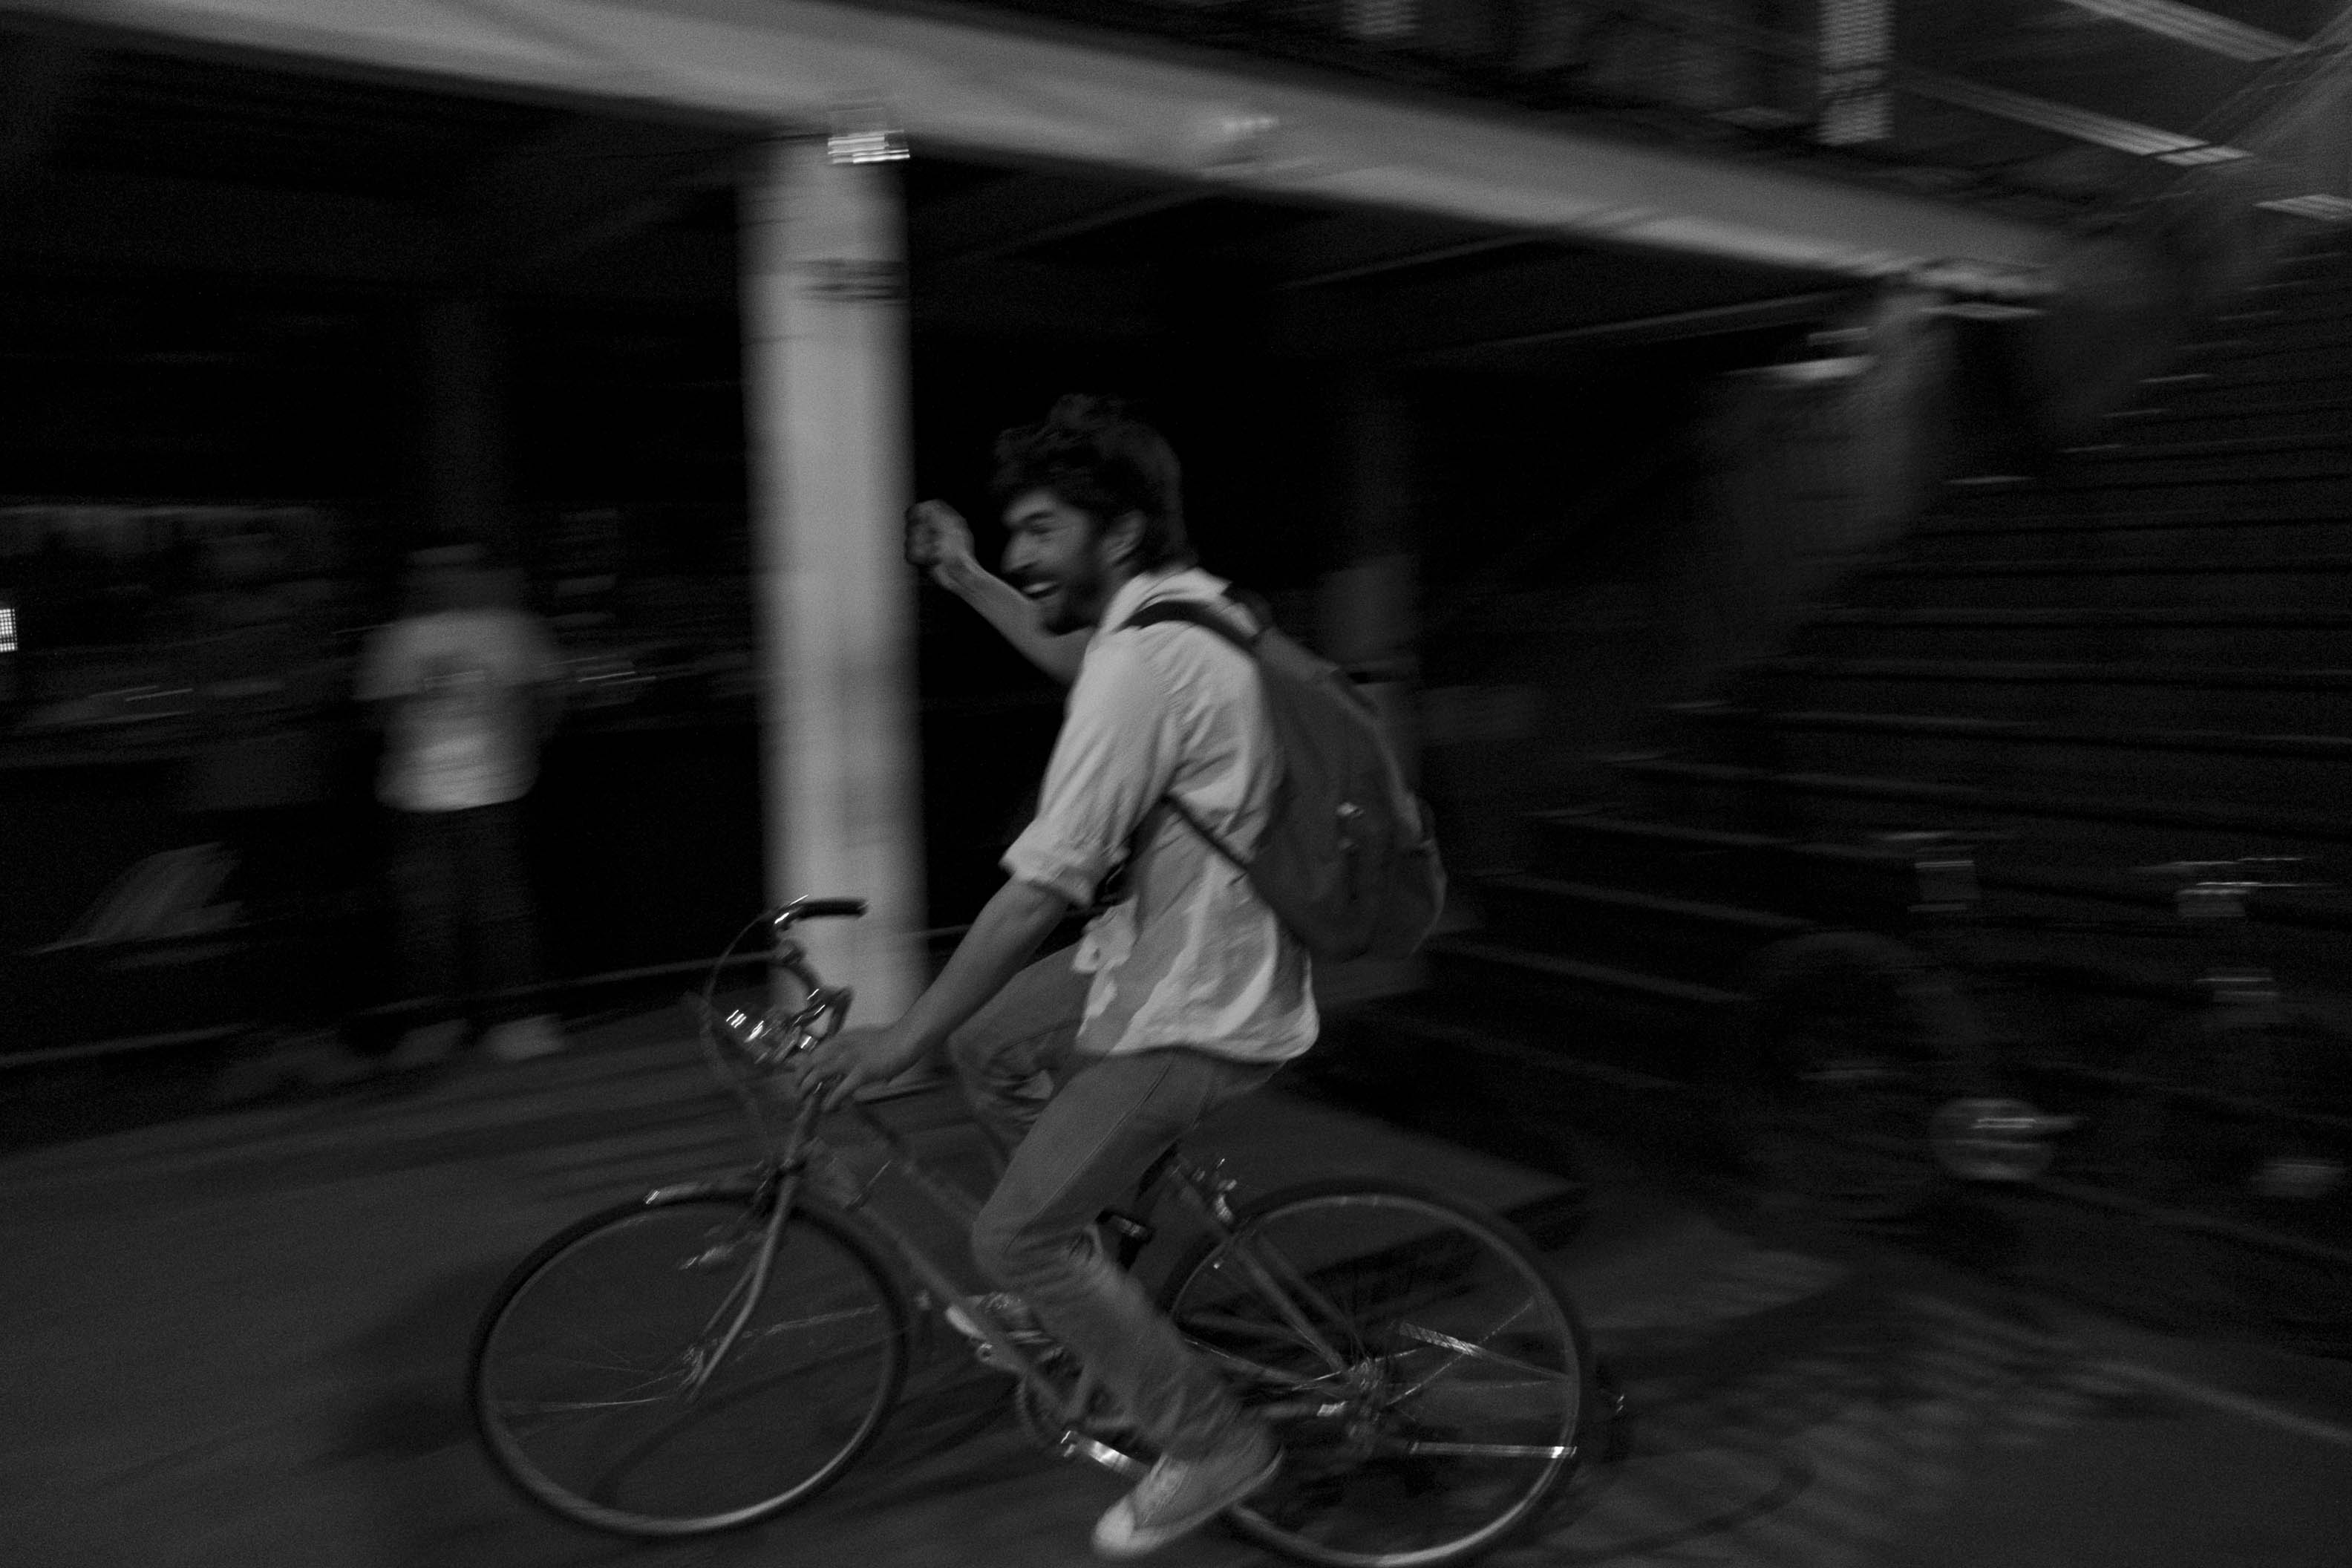 Leo en bici 2